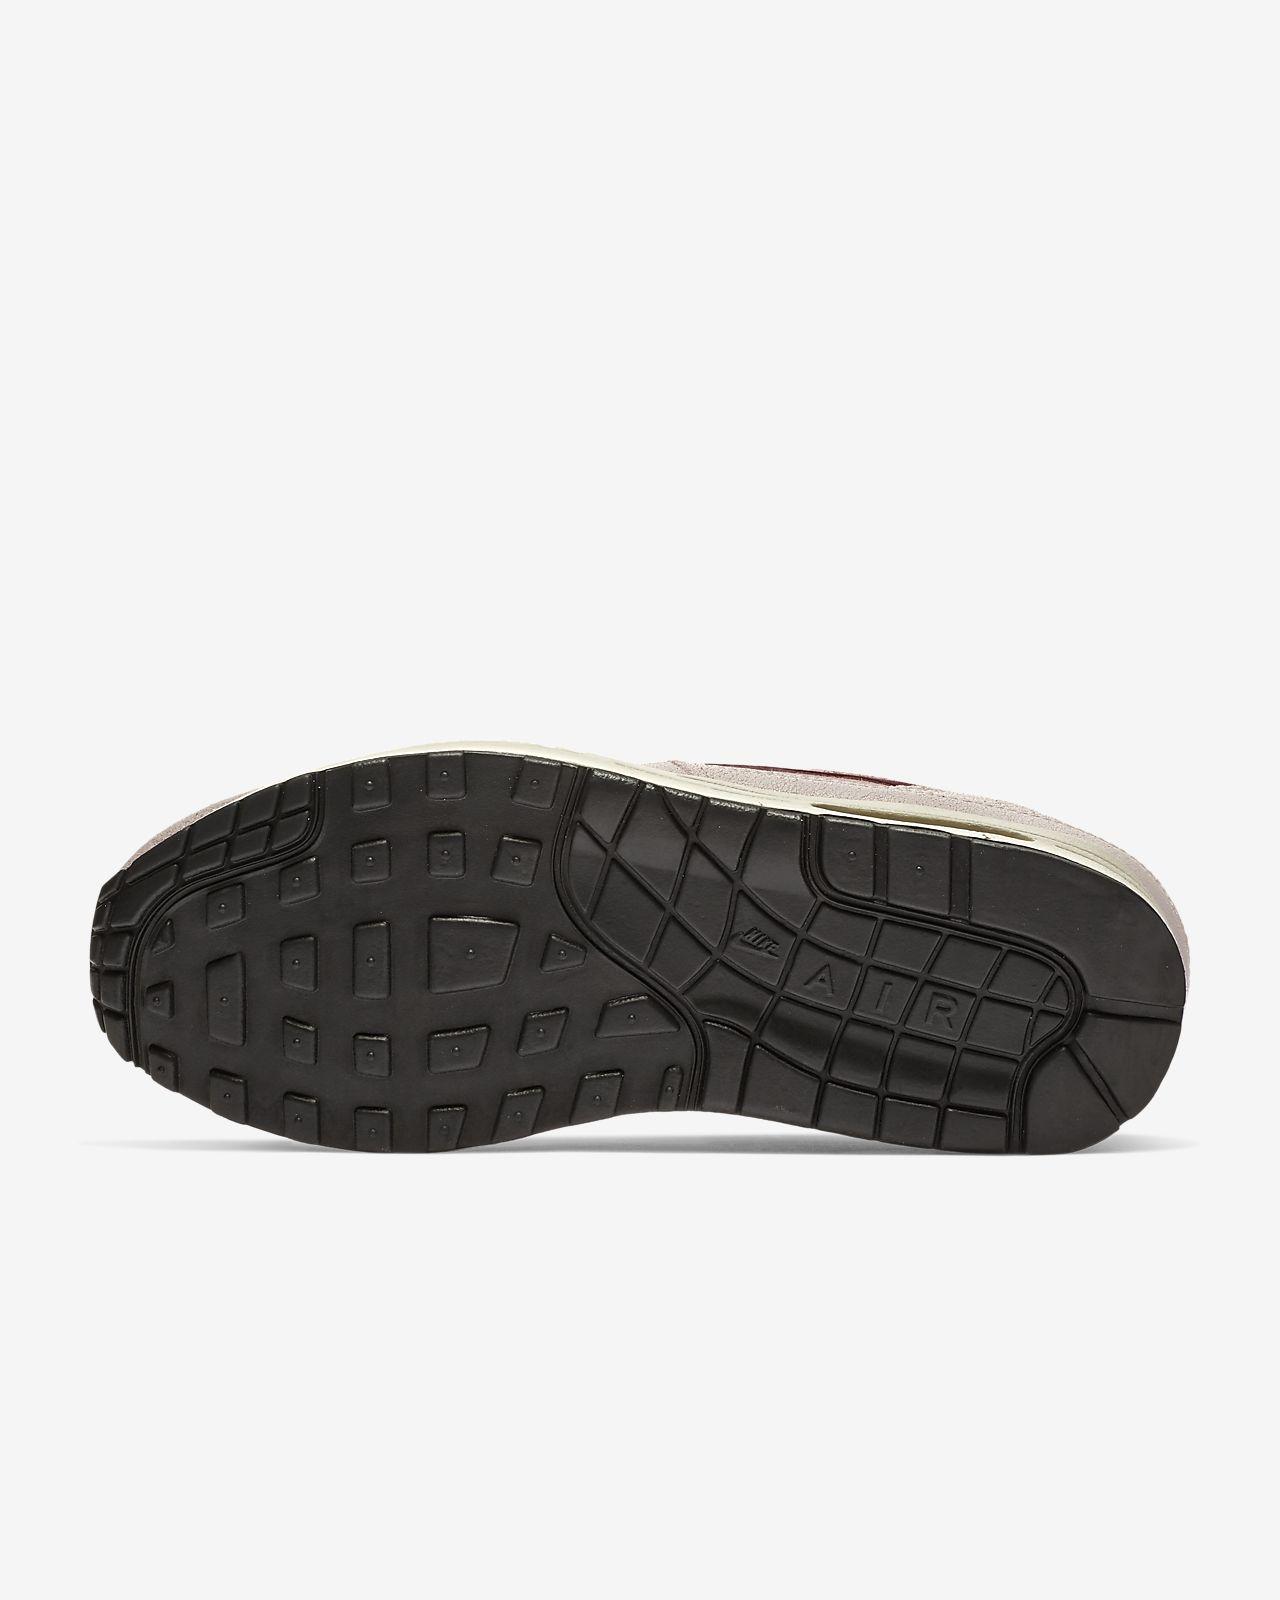 official photos 9b0b3 3ff05 Low Resolution Nike Air Max 1 Premium Zapatillas - Mujer Nike Air Max 1  Premium Zapatillas - Mujer